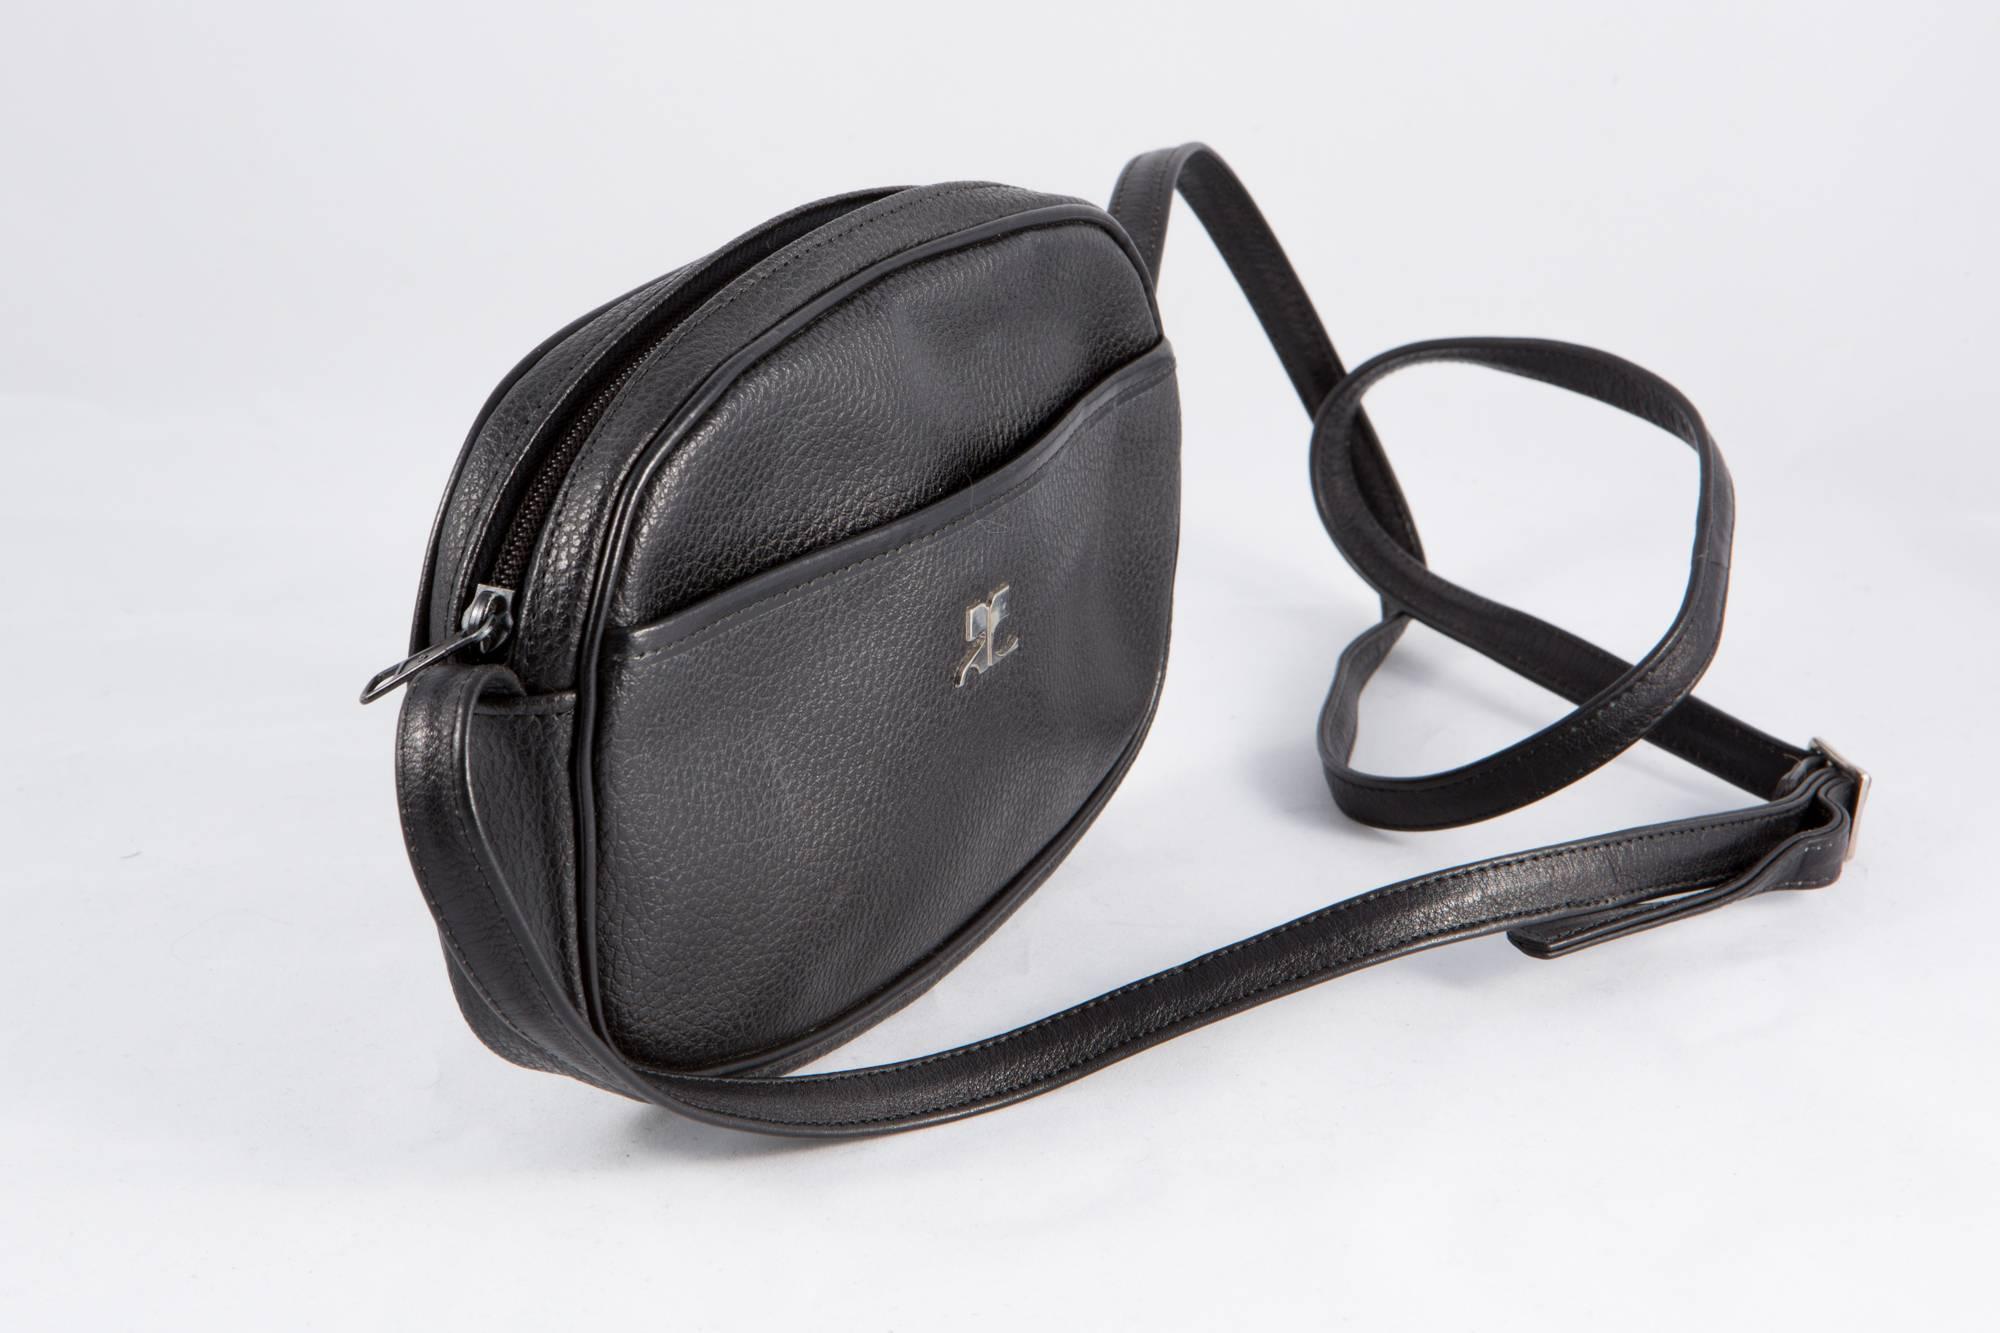 André Courrèges Black Patent Courreges Camera Crossbody Bag oMvqvMctv